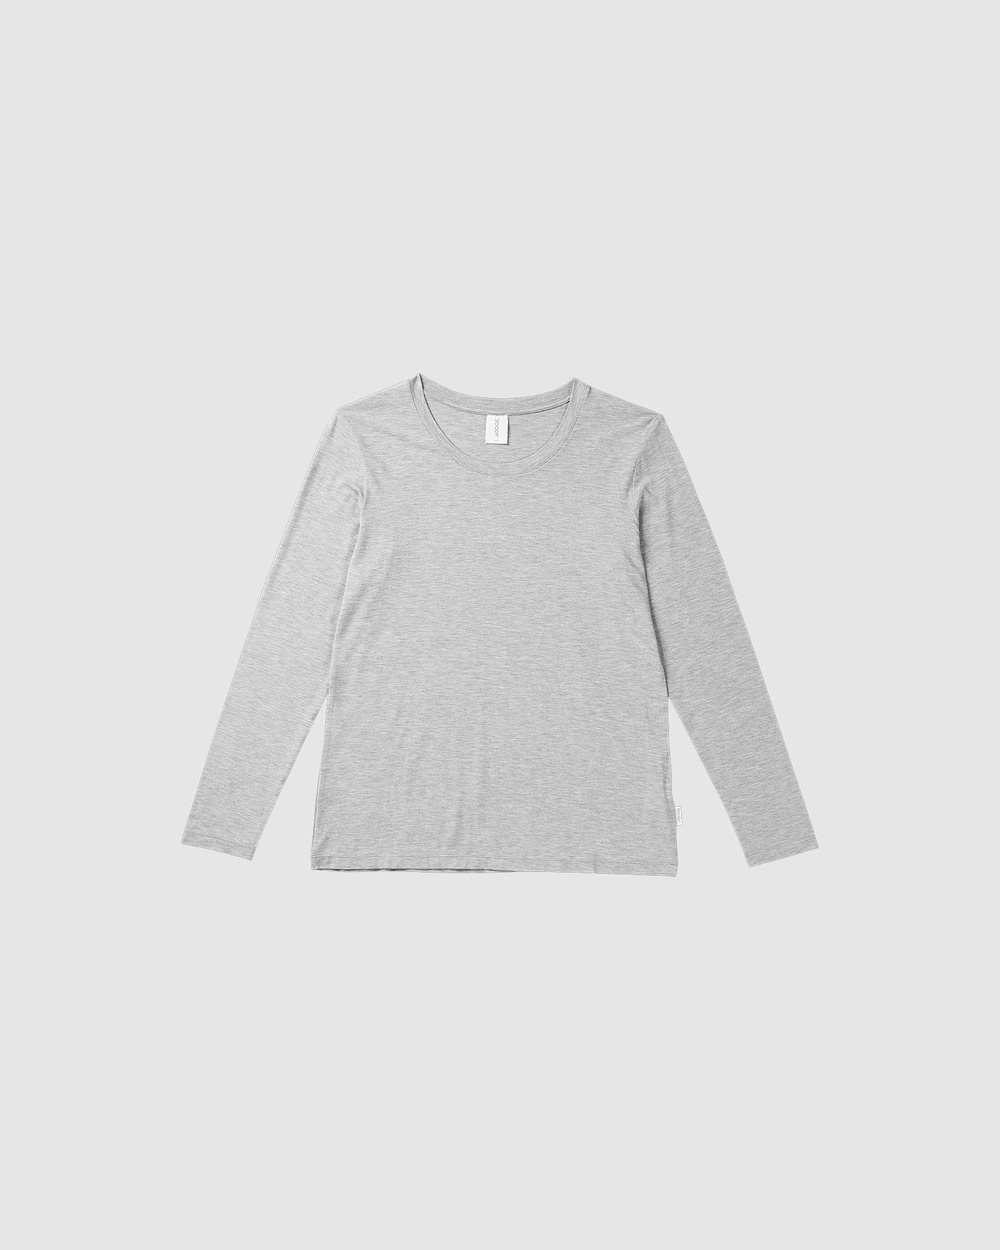 Boody Organic Bamboo Eco Wear - 2 Pack Long Sleeve T Shirt - Long Sleeve T-Shirts (Multi) 2 Pack Long Sleeve T-Shirt